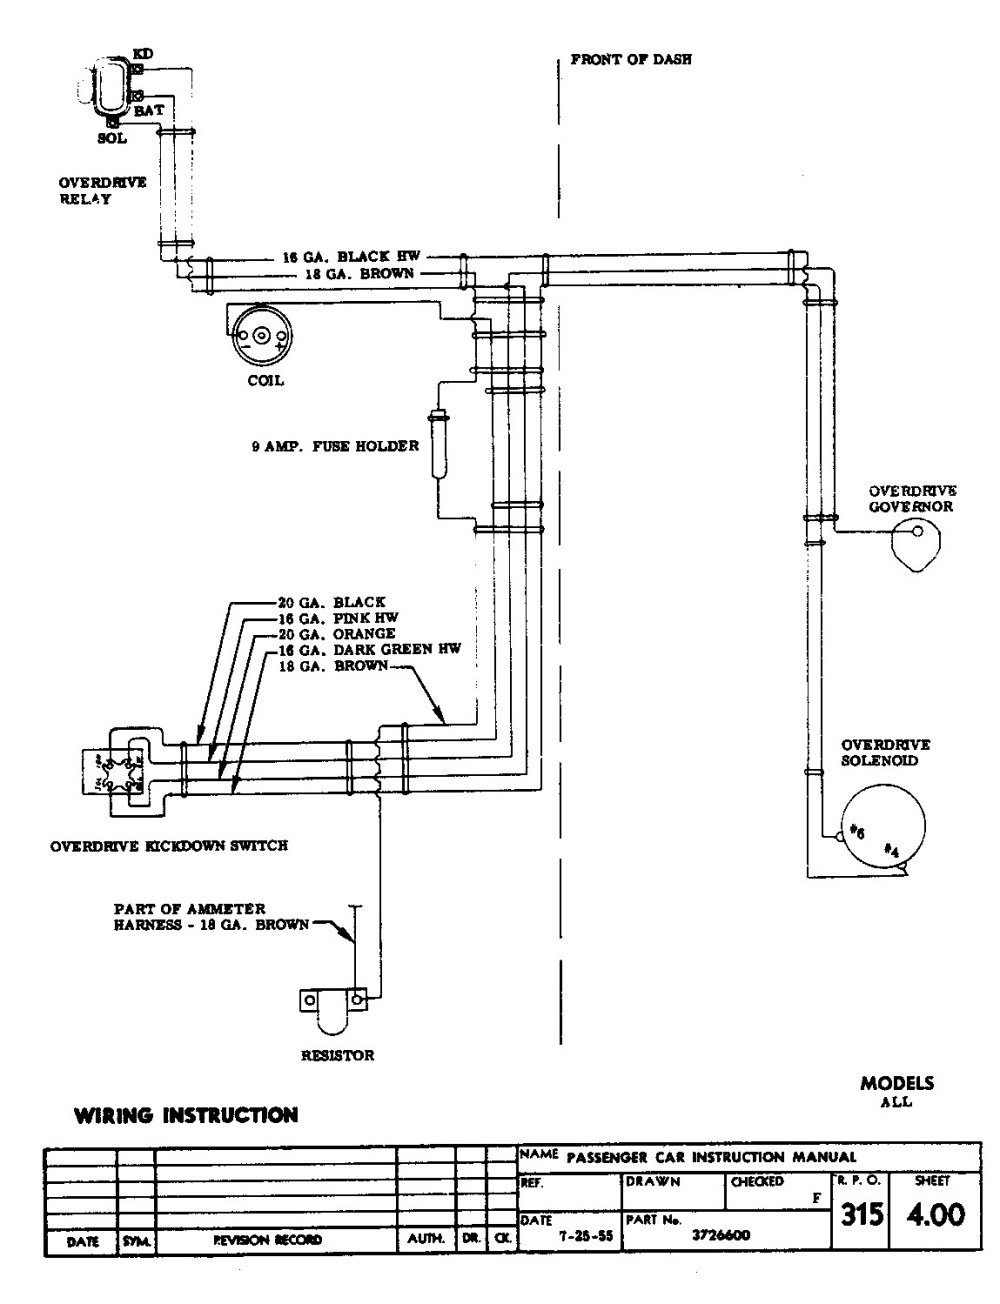 medium resolution of 1955 chevy voltage regulator wiring diagram complete wiring diagrams u2022 rh ibeegu co delco remy voltage